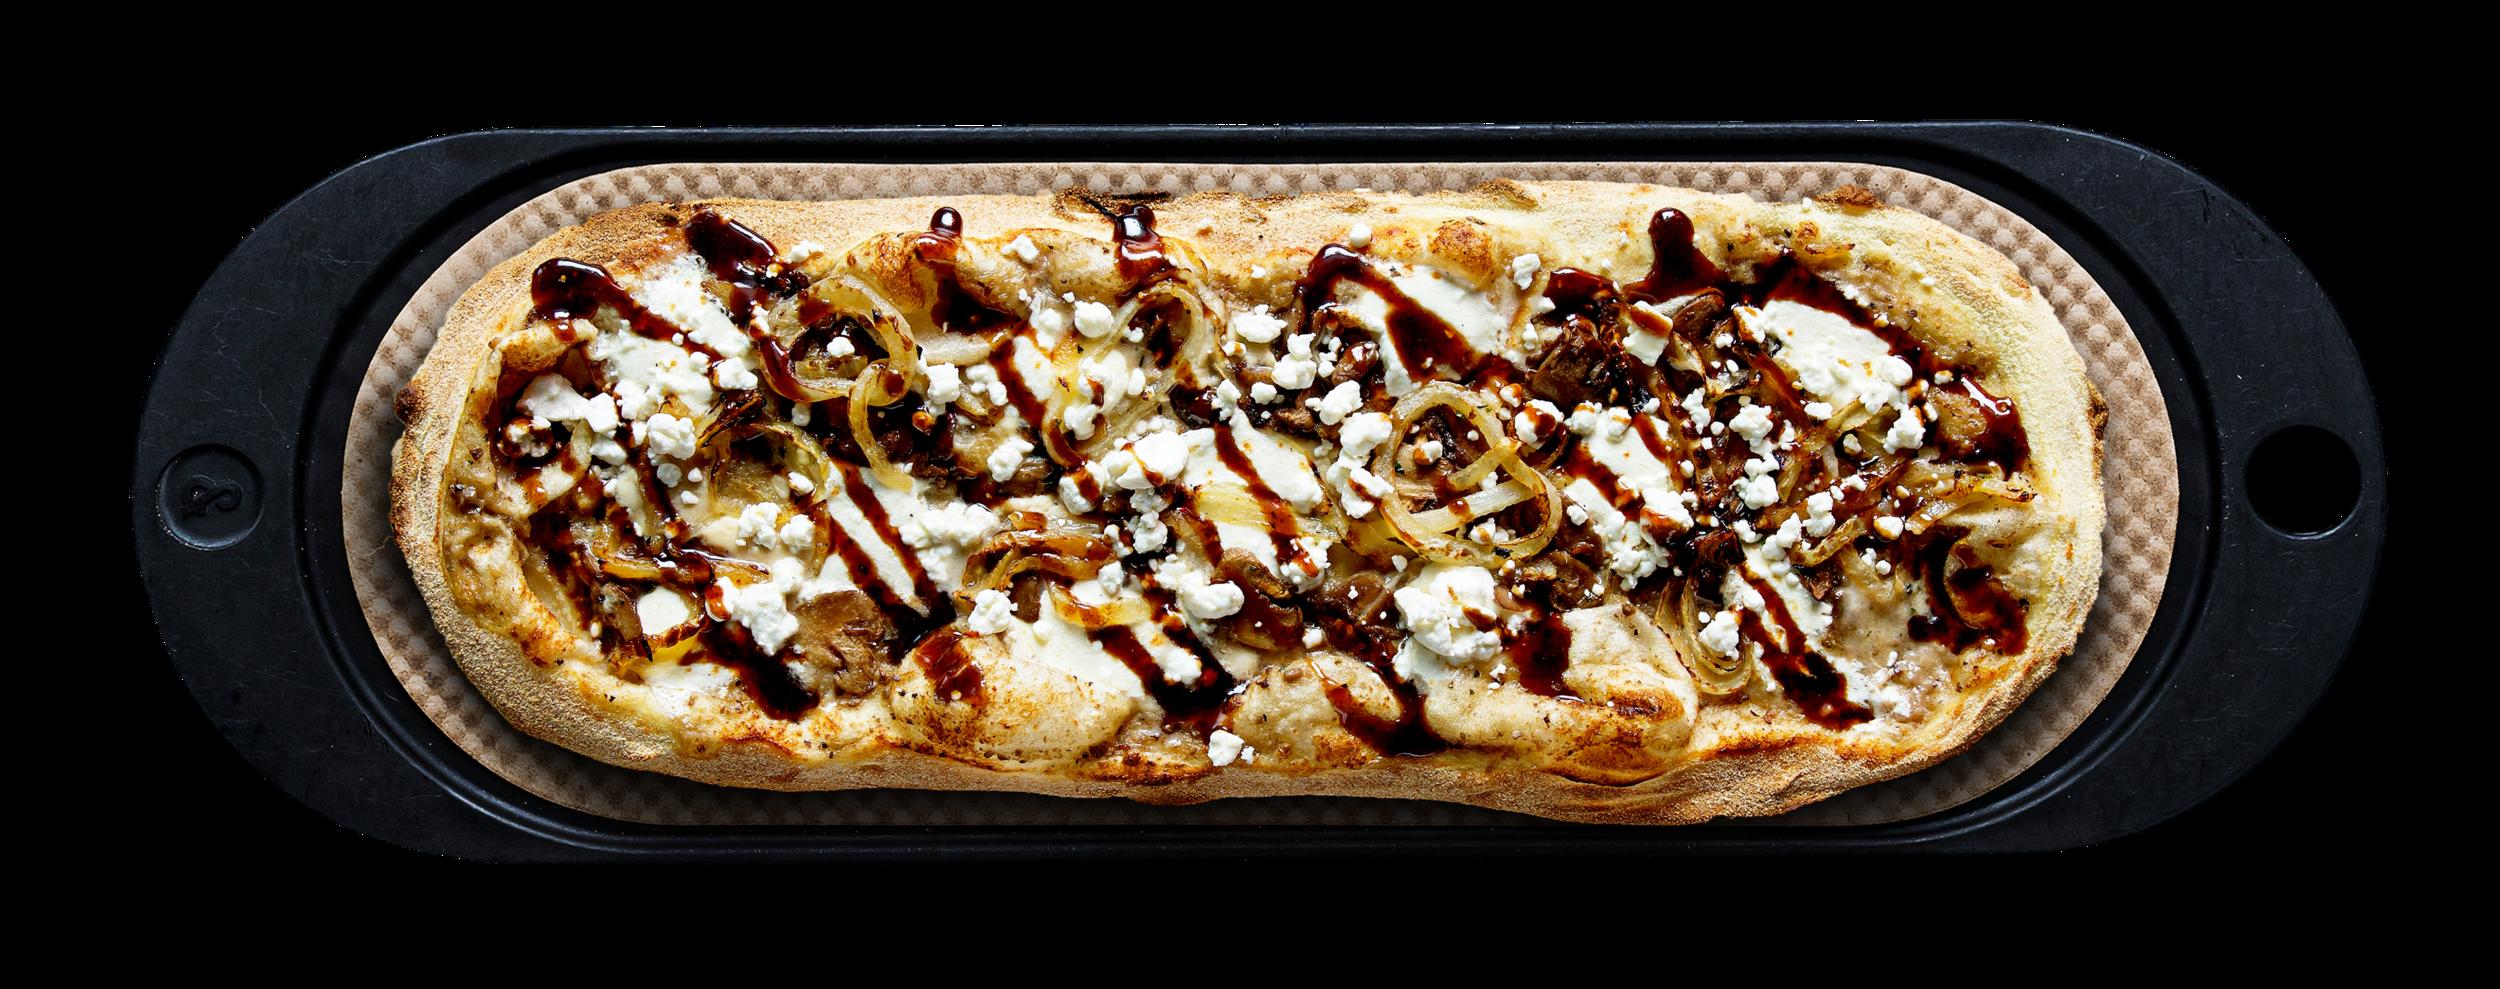 MOONSTRUCK - Mushroom truffle, garlic ricotta, fresh mozzarella, grilled onion, mushroom, goat cheese, fig balsamic